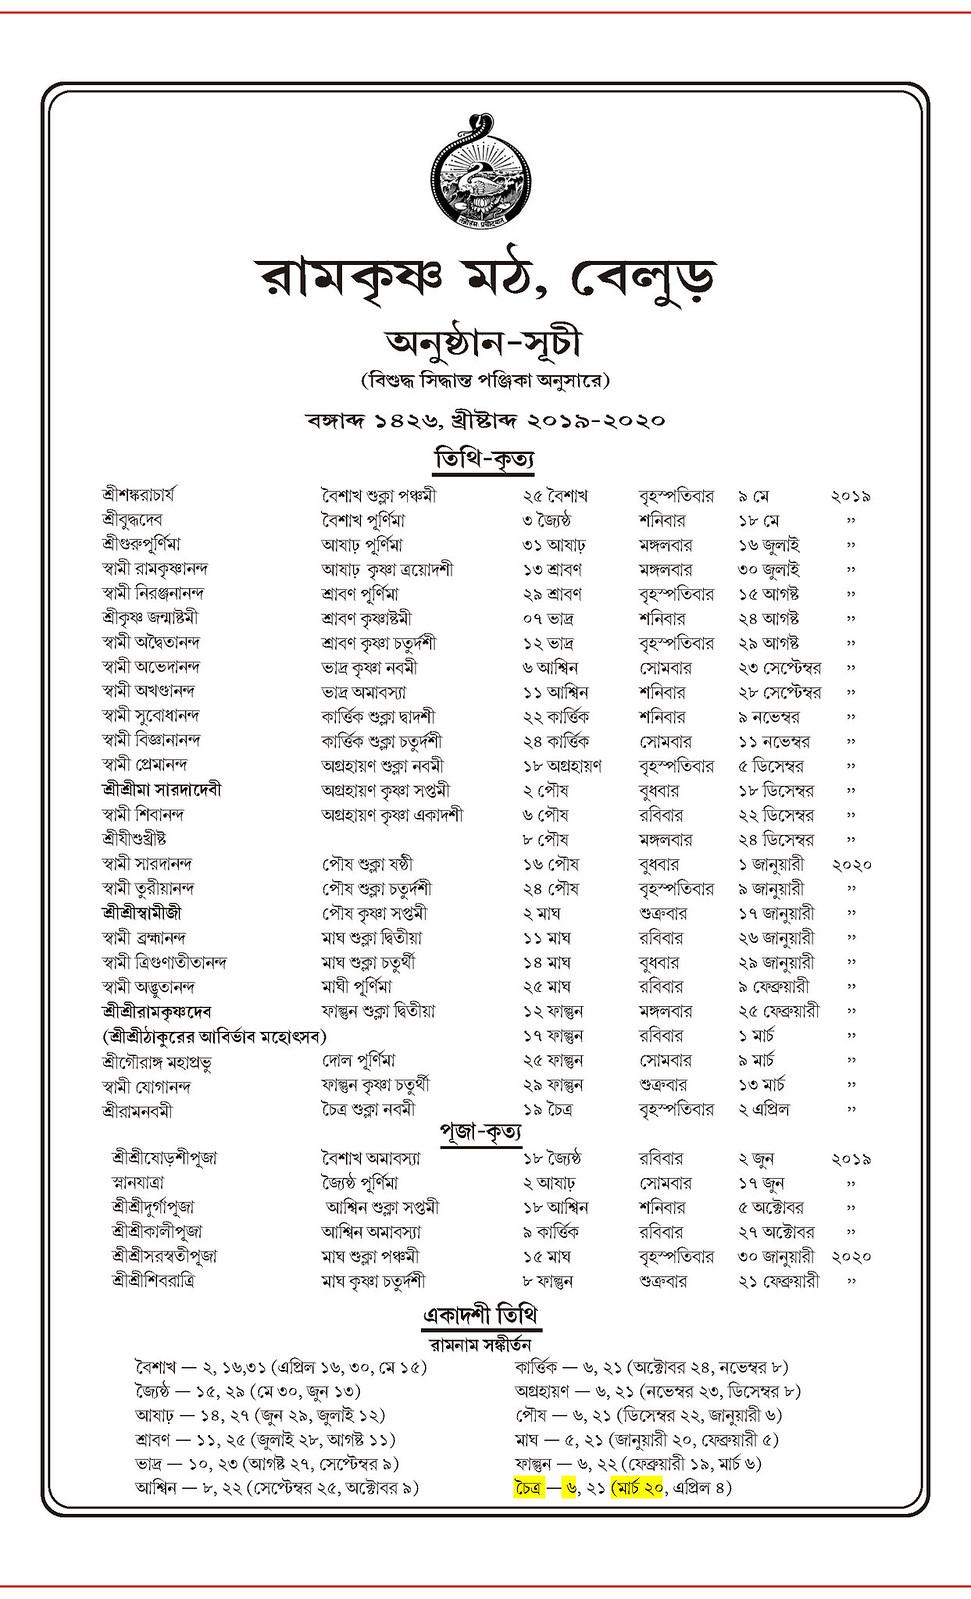 Belur Math Festival Calendar (2019-20) - Belur Math - Ramakrishna